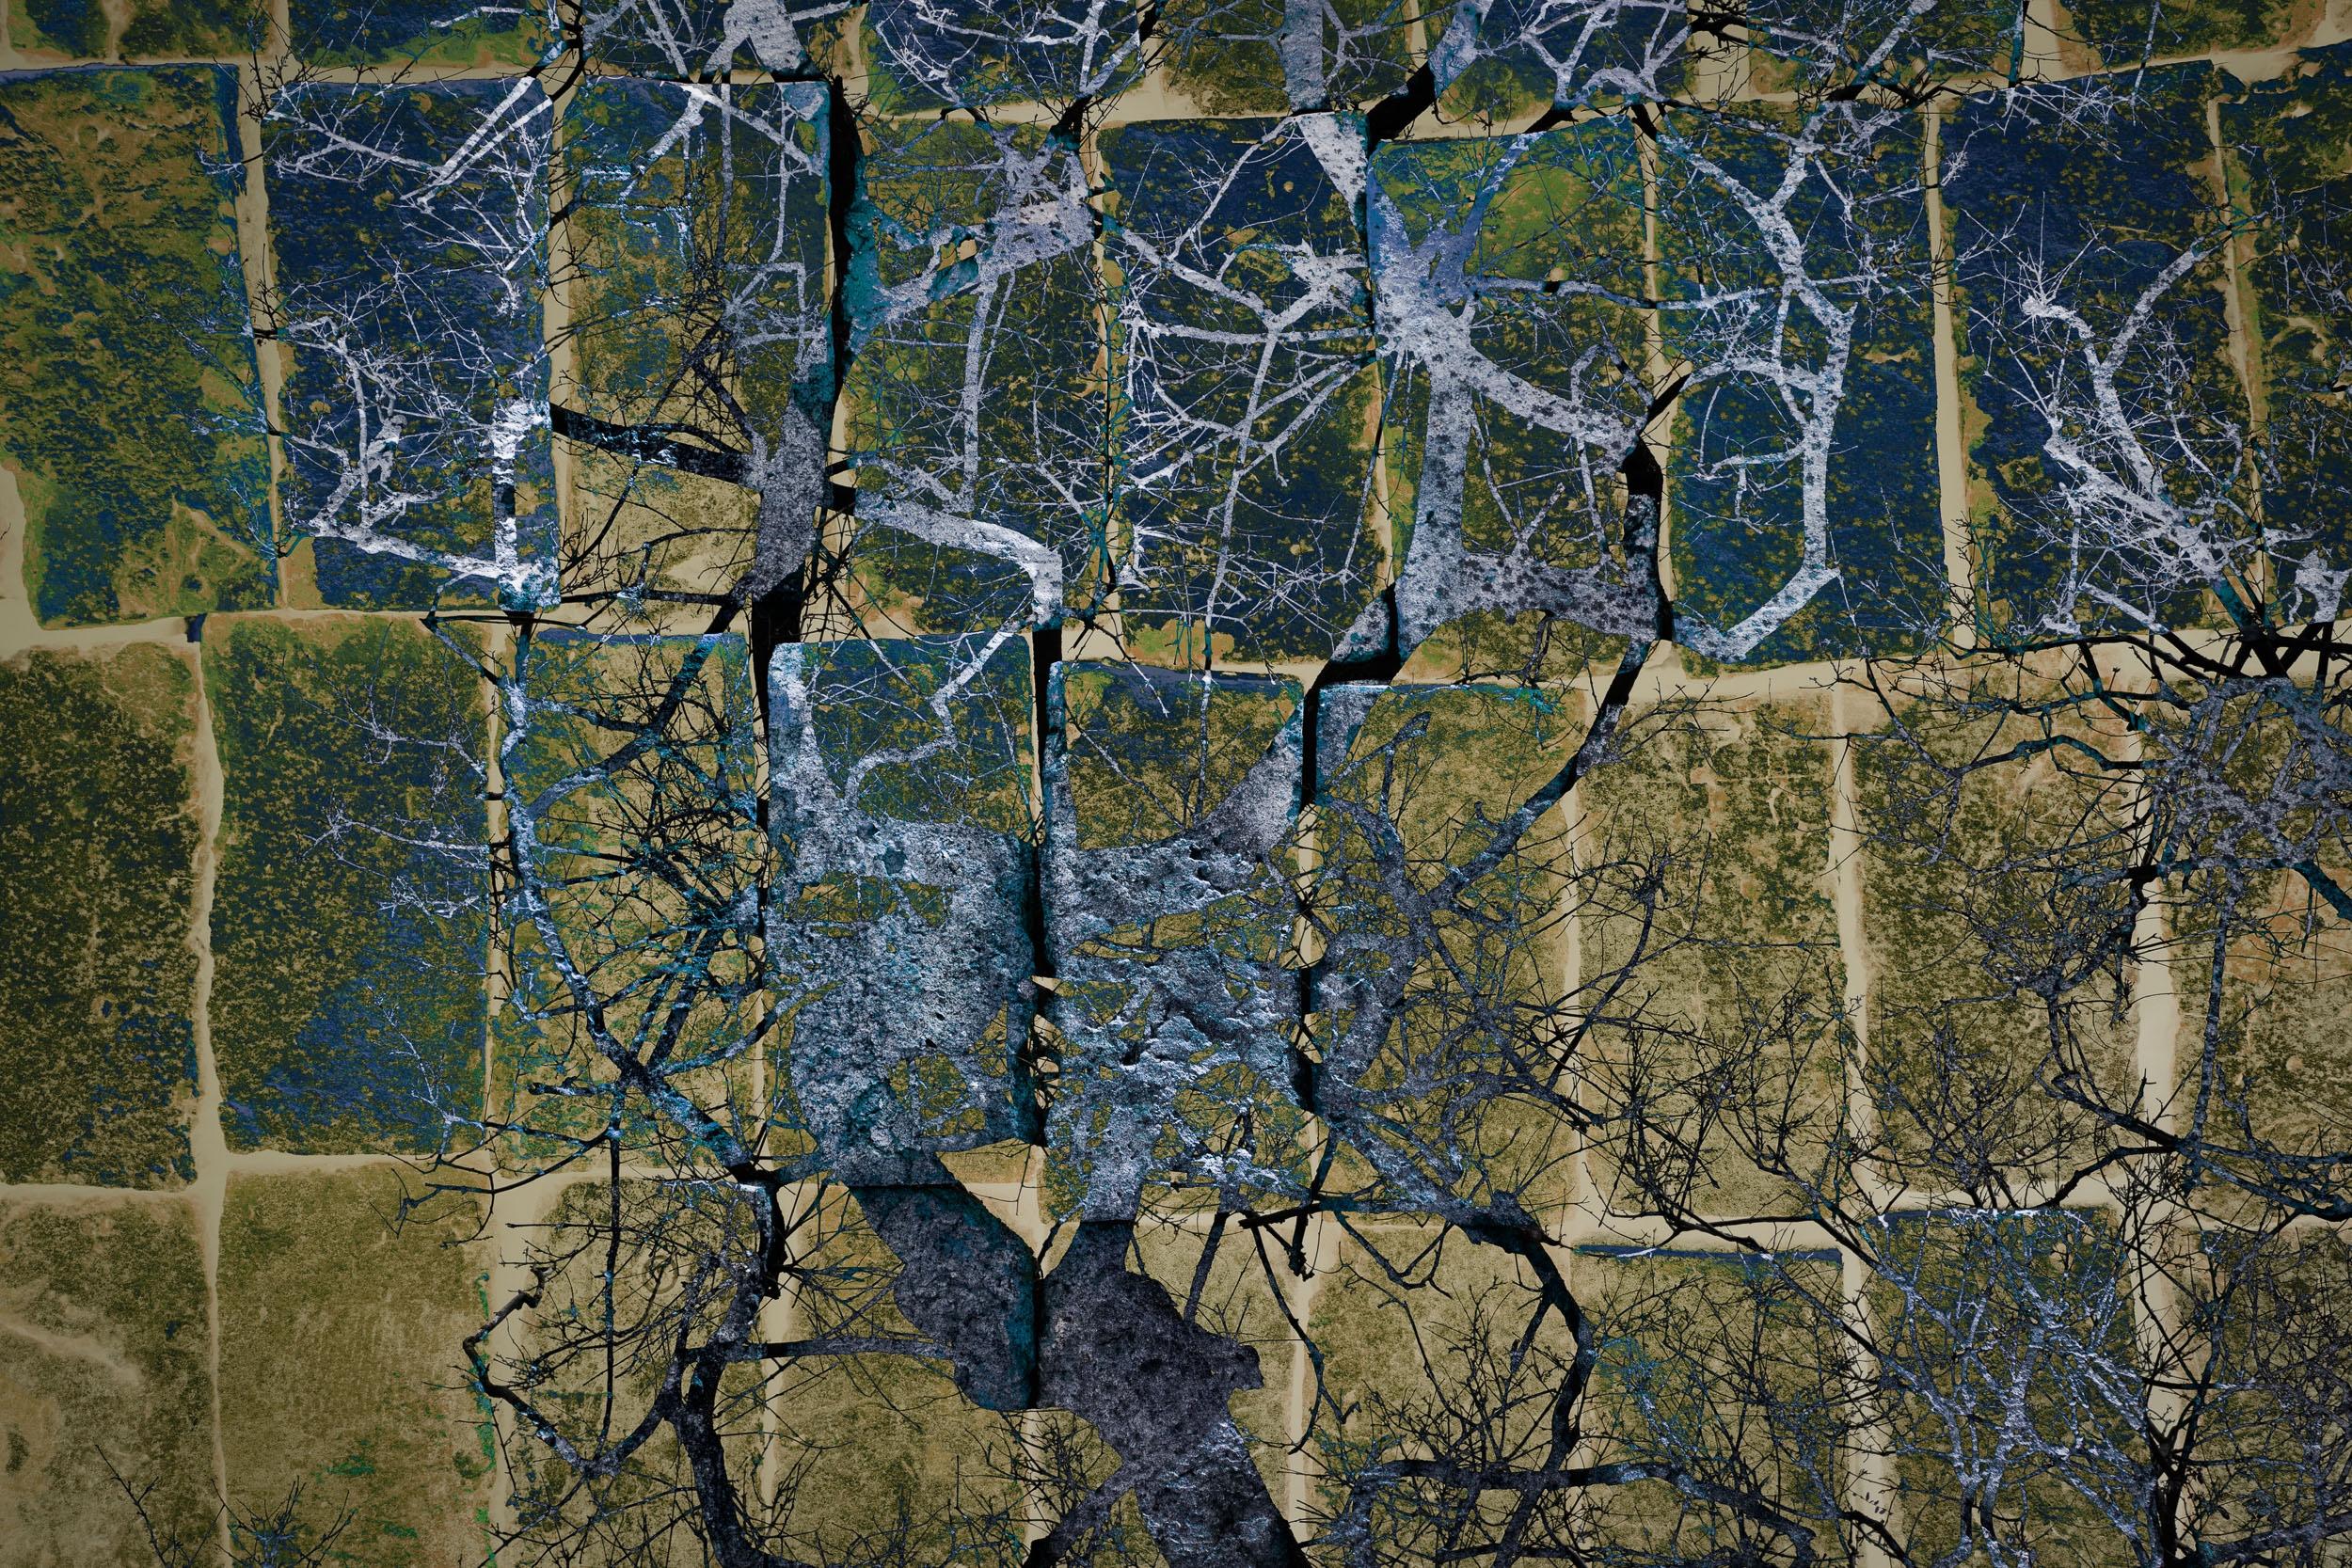 Disappearing Trees III /Árboles Desapareciendos III